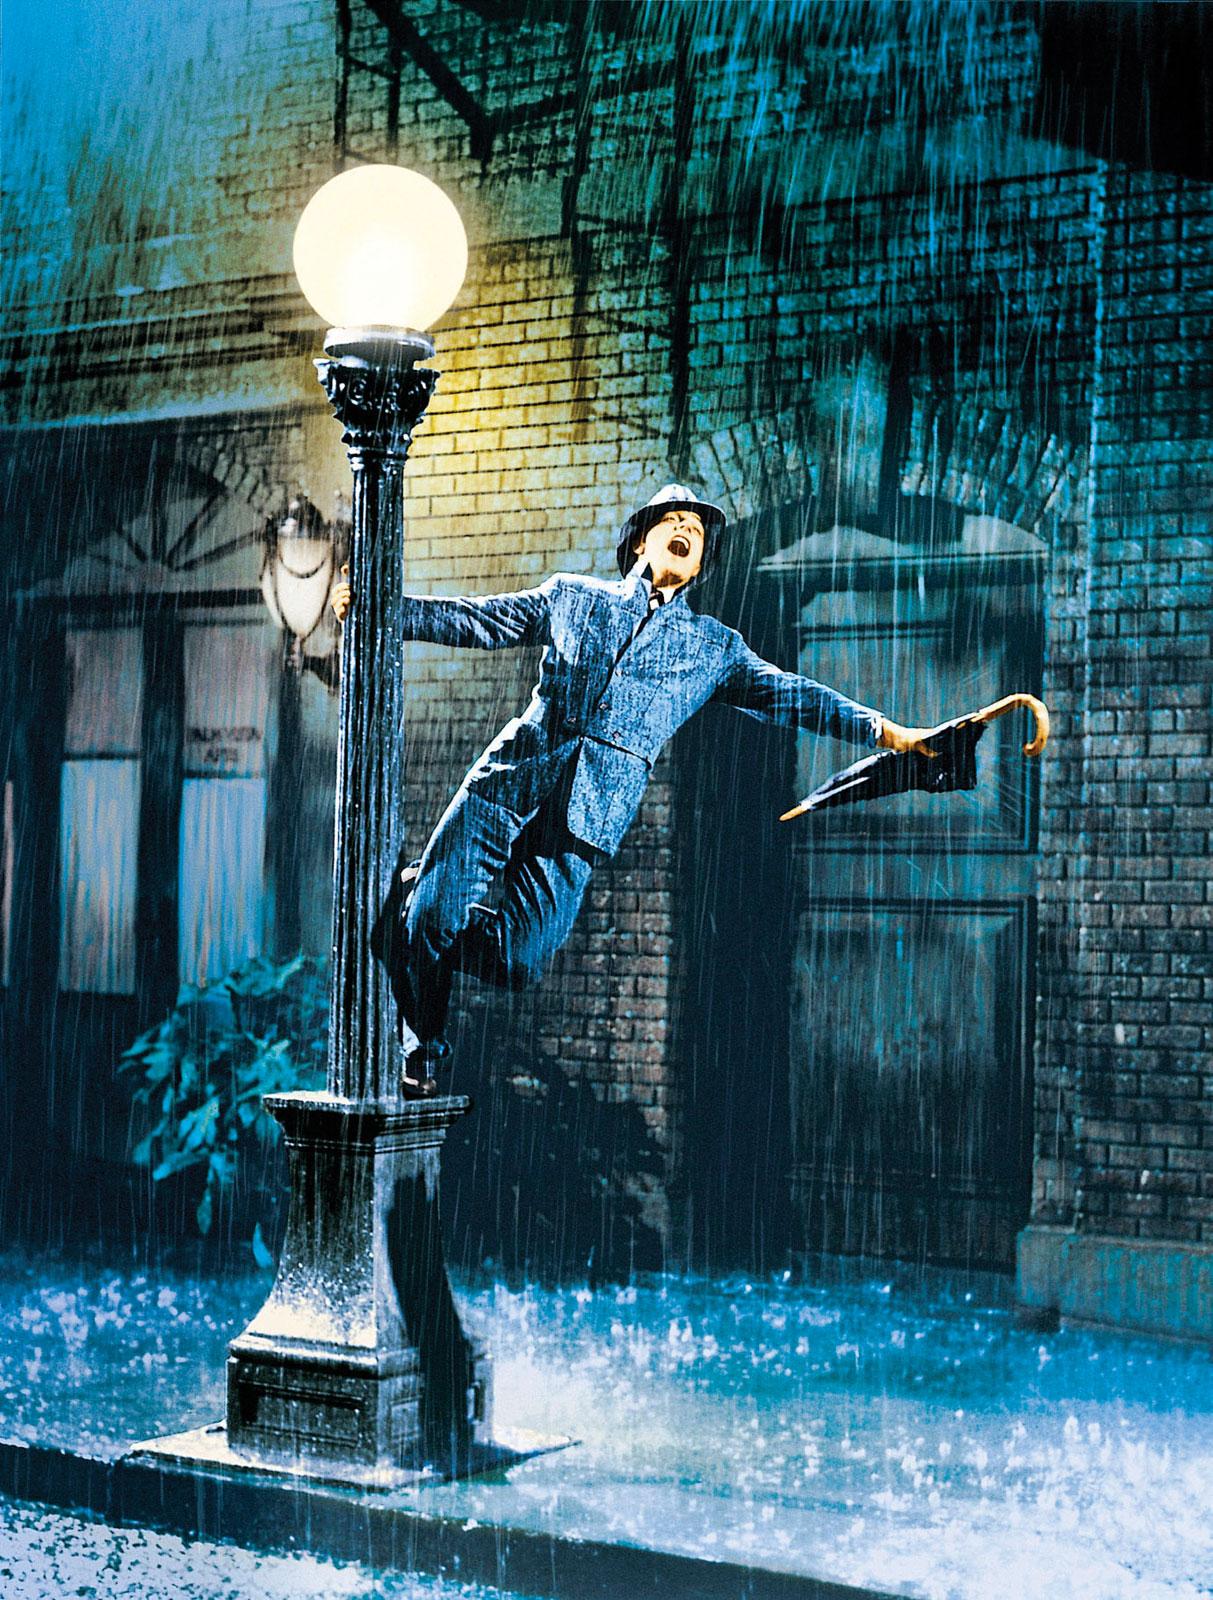 Singin In The Rain Wallpapers Movie Hq Singin In The Rain Pictures 4k Wallpapers 2019